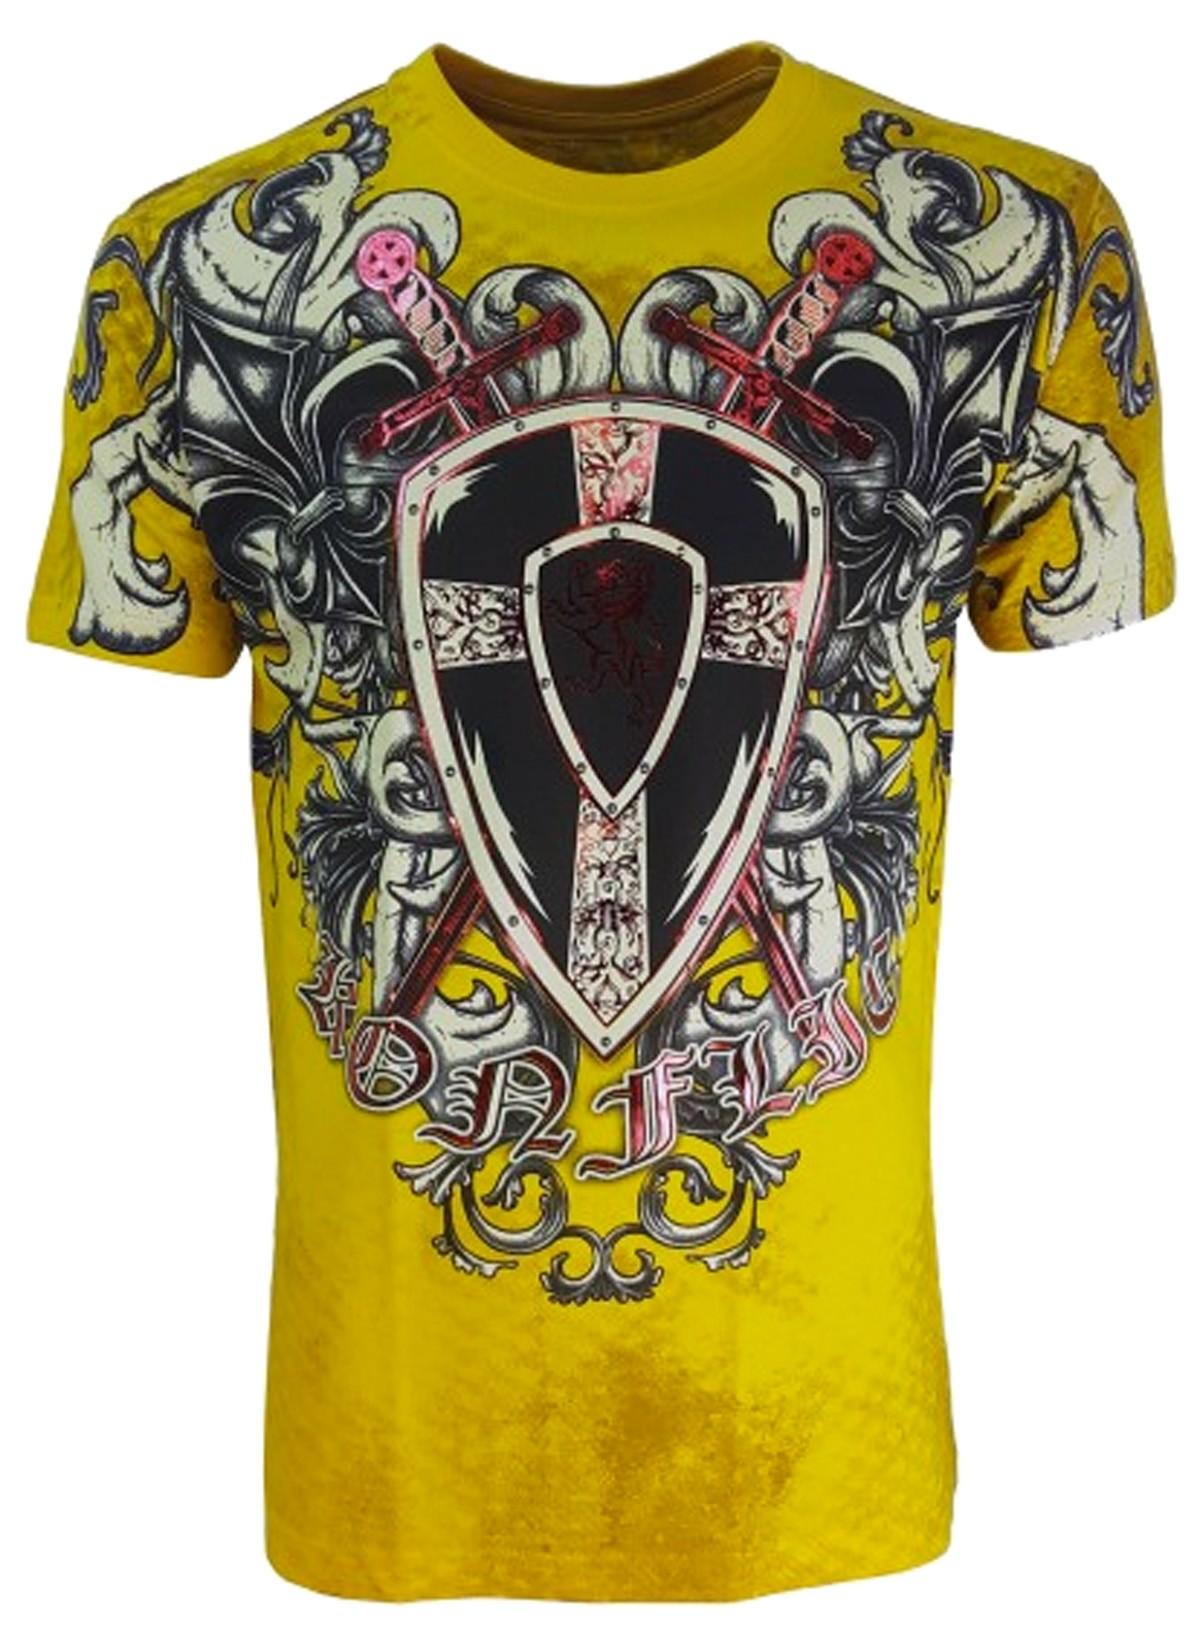 Konflic Clothing - Battle Crest T-Shirt